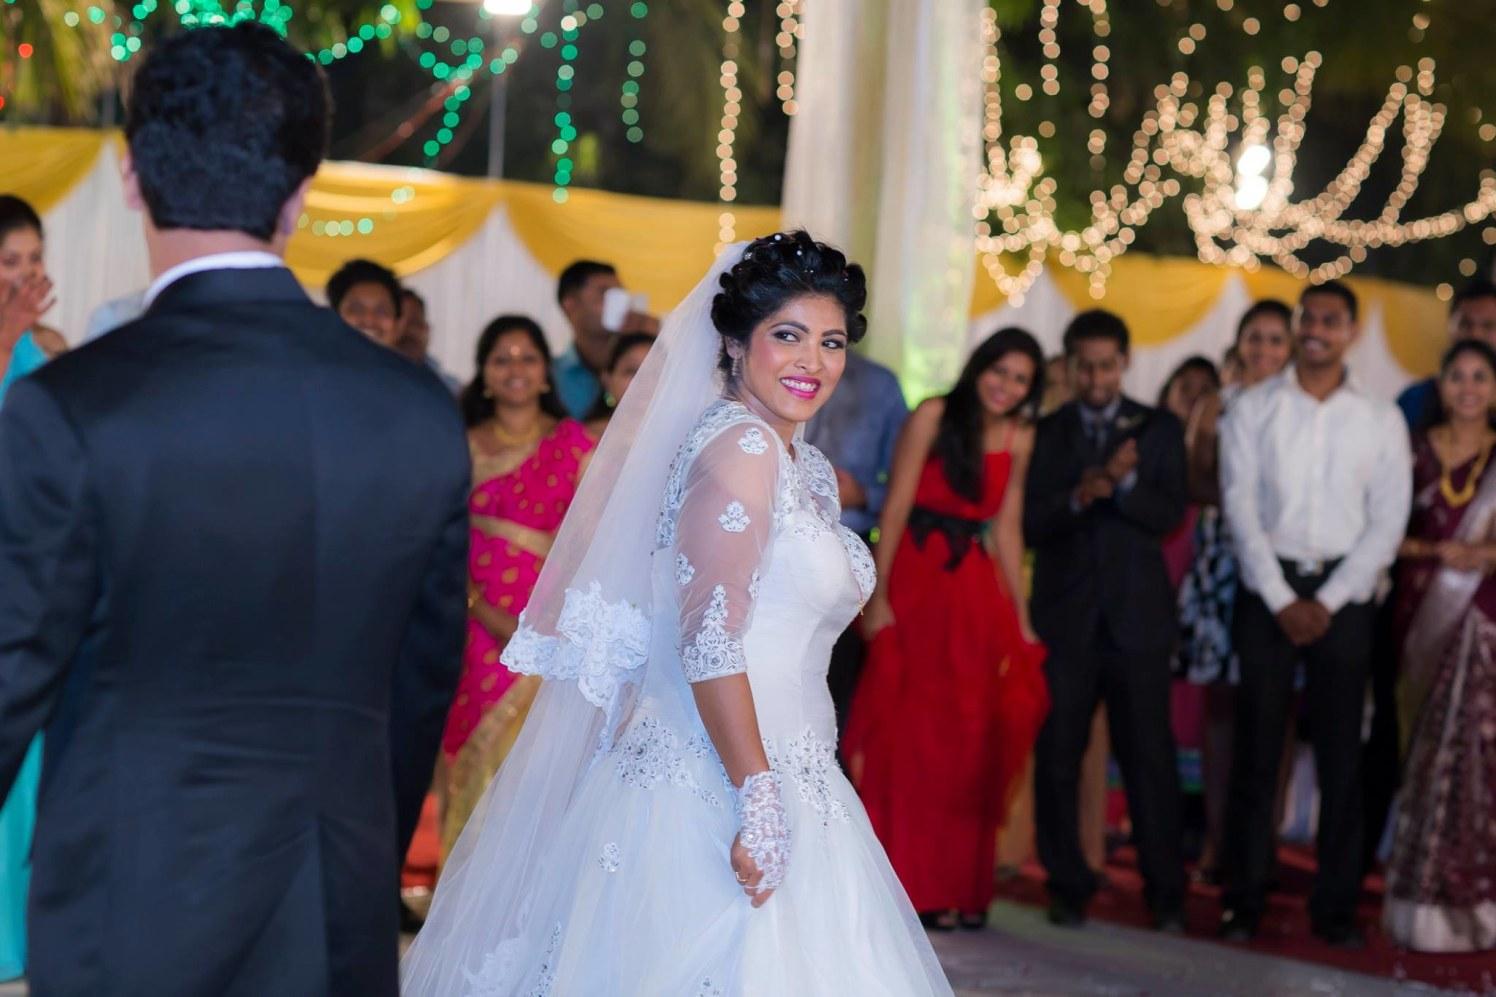 Christian Bride Wearing Appealing White Gown by Lloyd Bangera Wedding-photography   Weddings Photos & Ideas